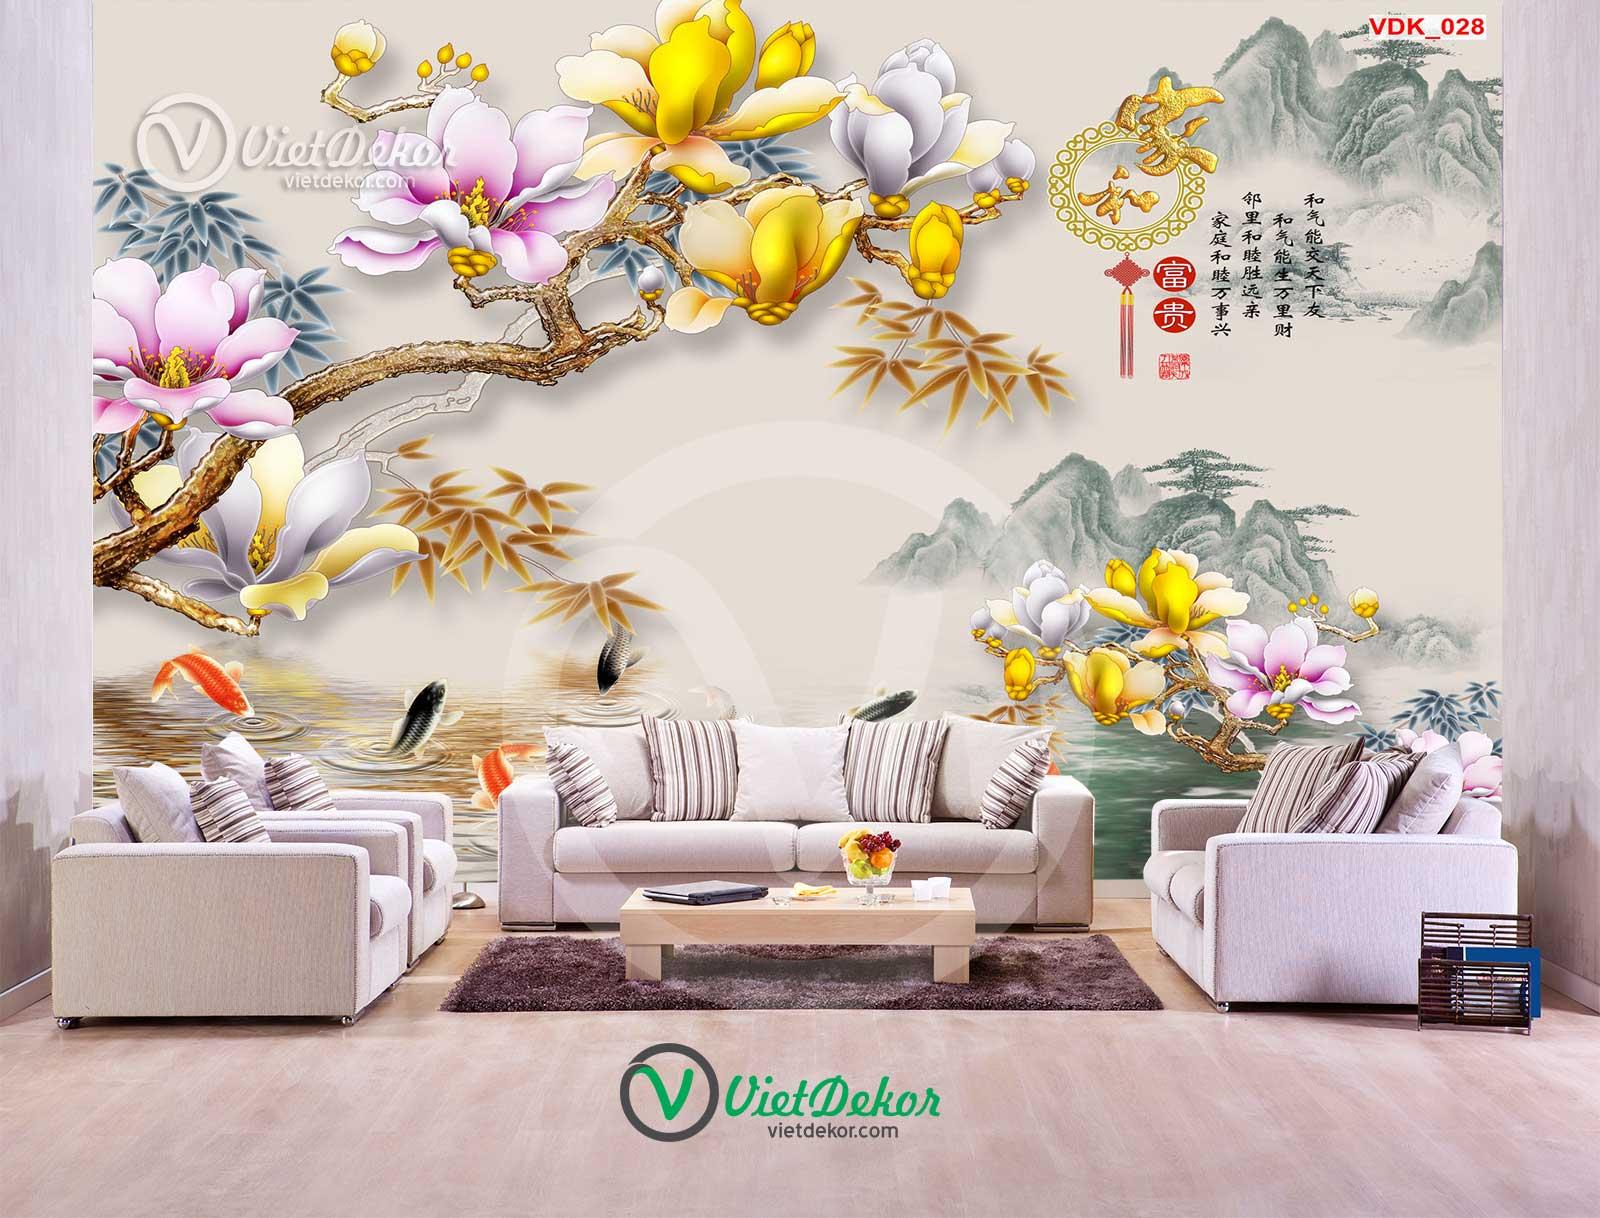 Tranh dán tường 3d hoa phong lan